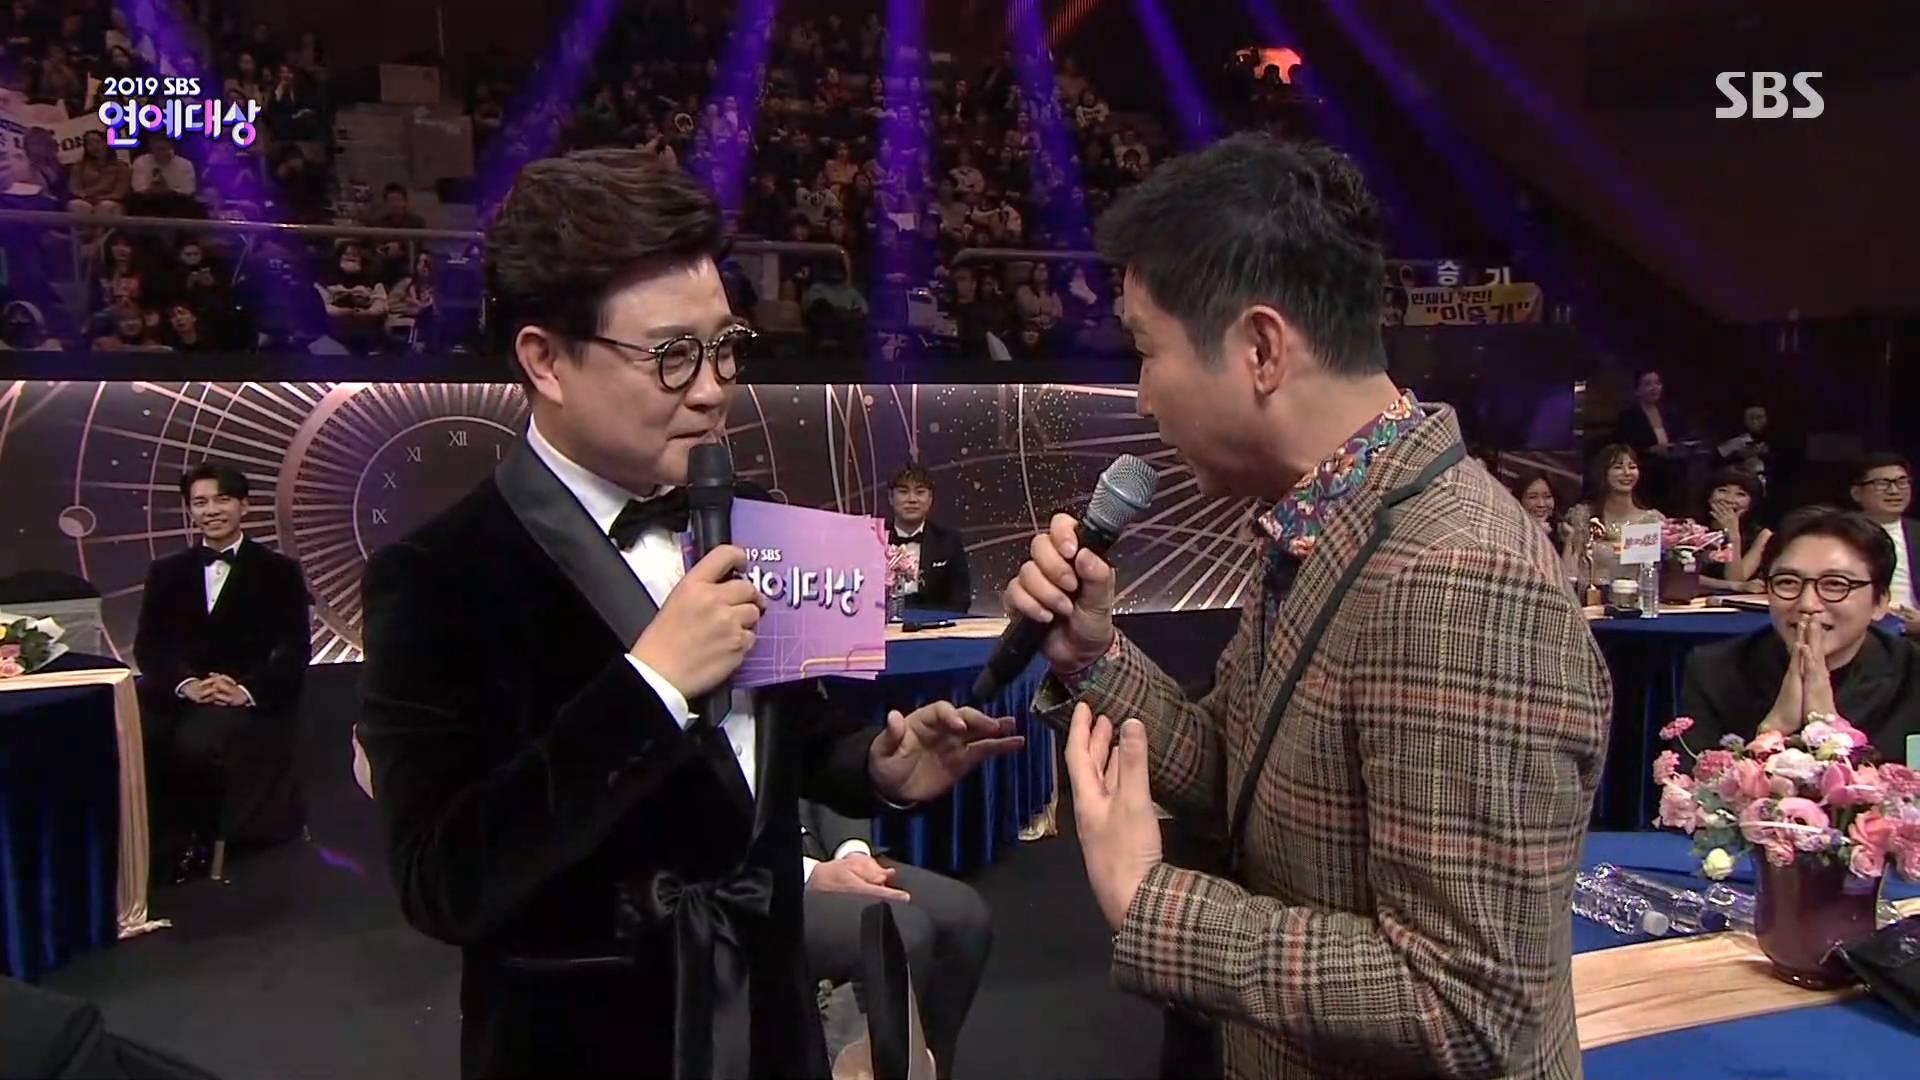 [SBS연예대상] 오늘 레전드였던 신동엽 대상 받으면 트로피를 바닥에 던지겠다는 발언.jpg   인스티즈